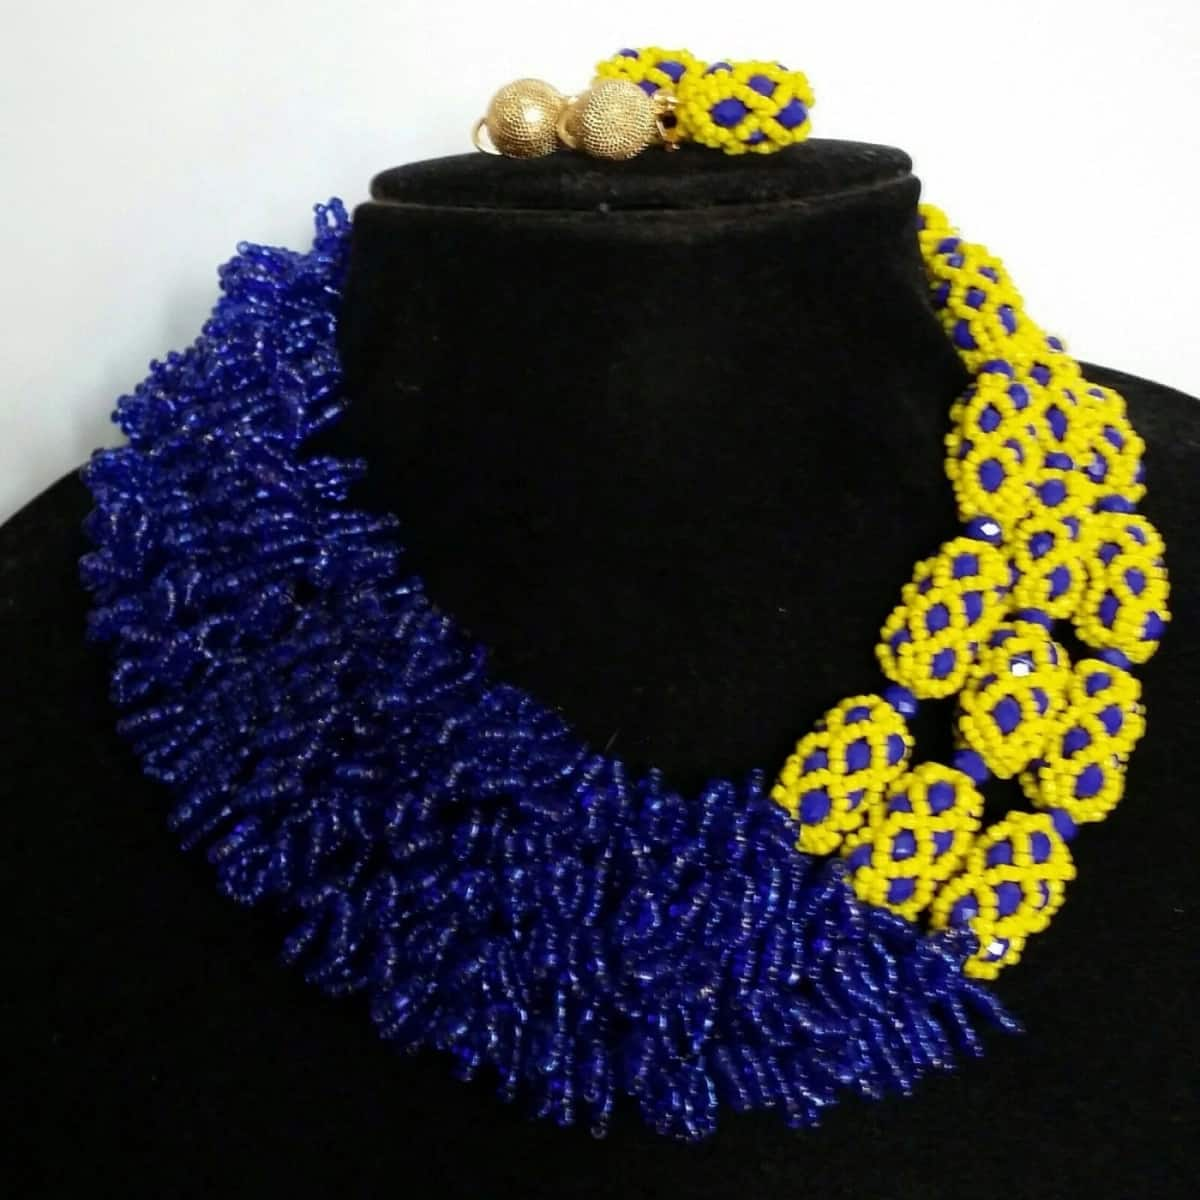 Asymmetric beads